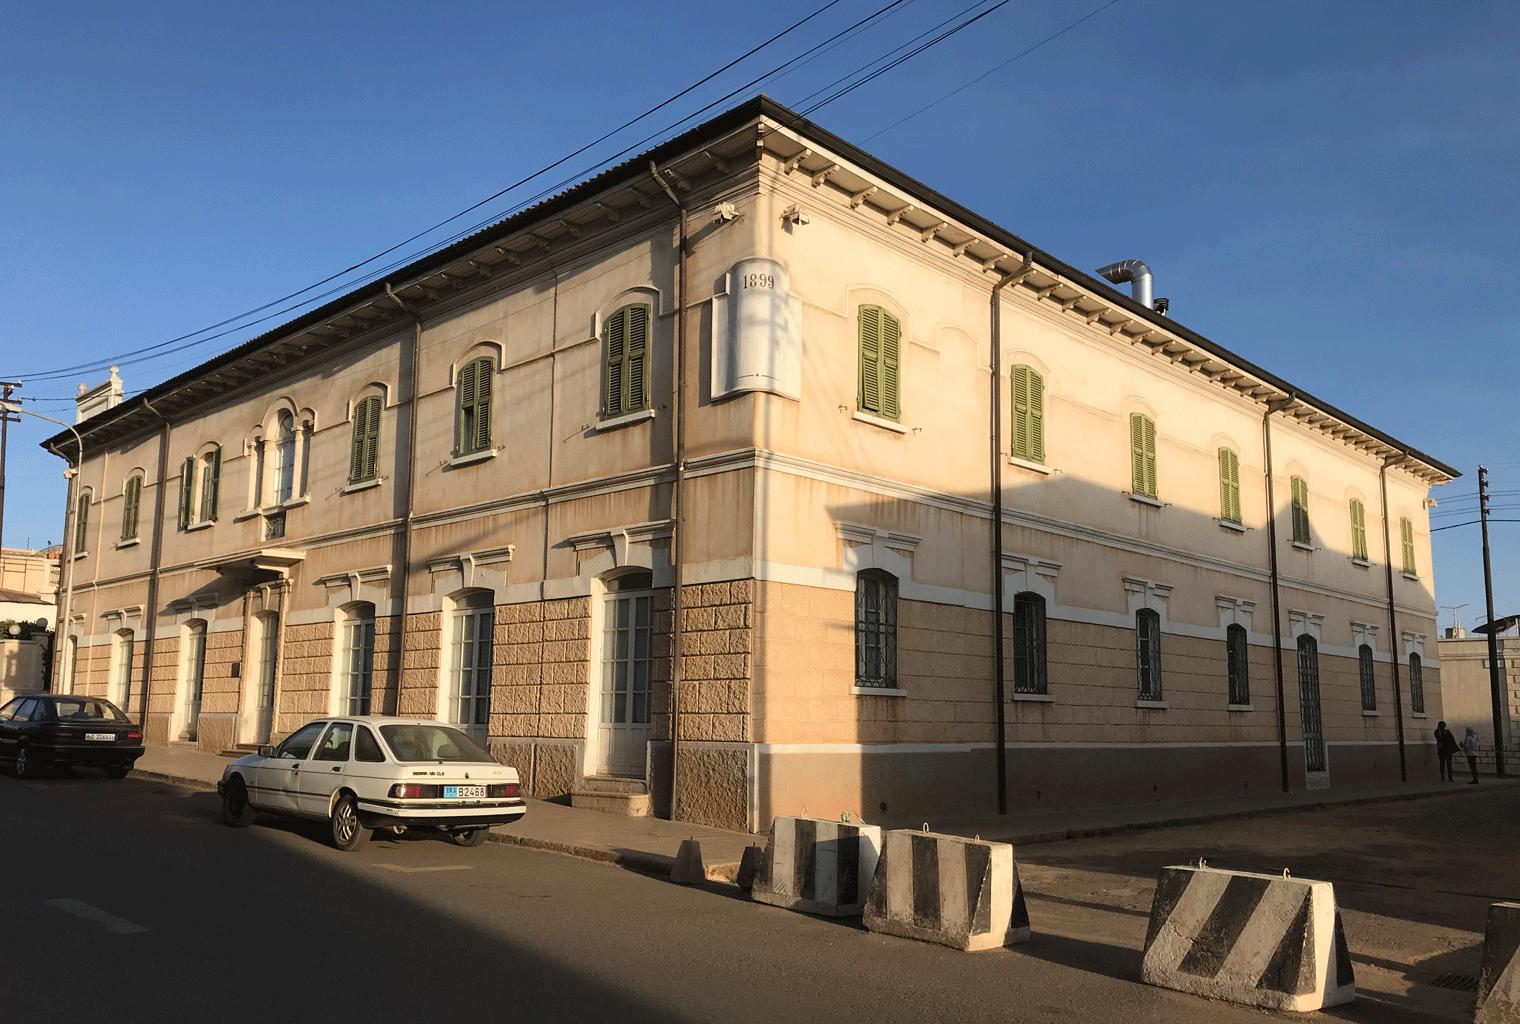 Eritrea-Exterior-Albergo-Italia-Accommodation